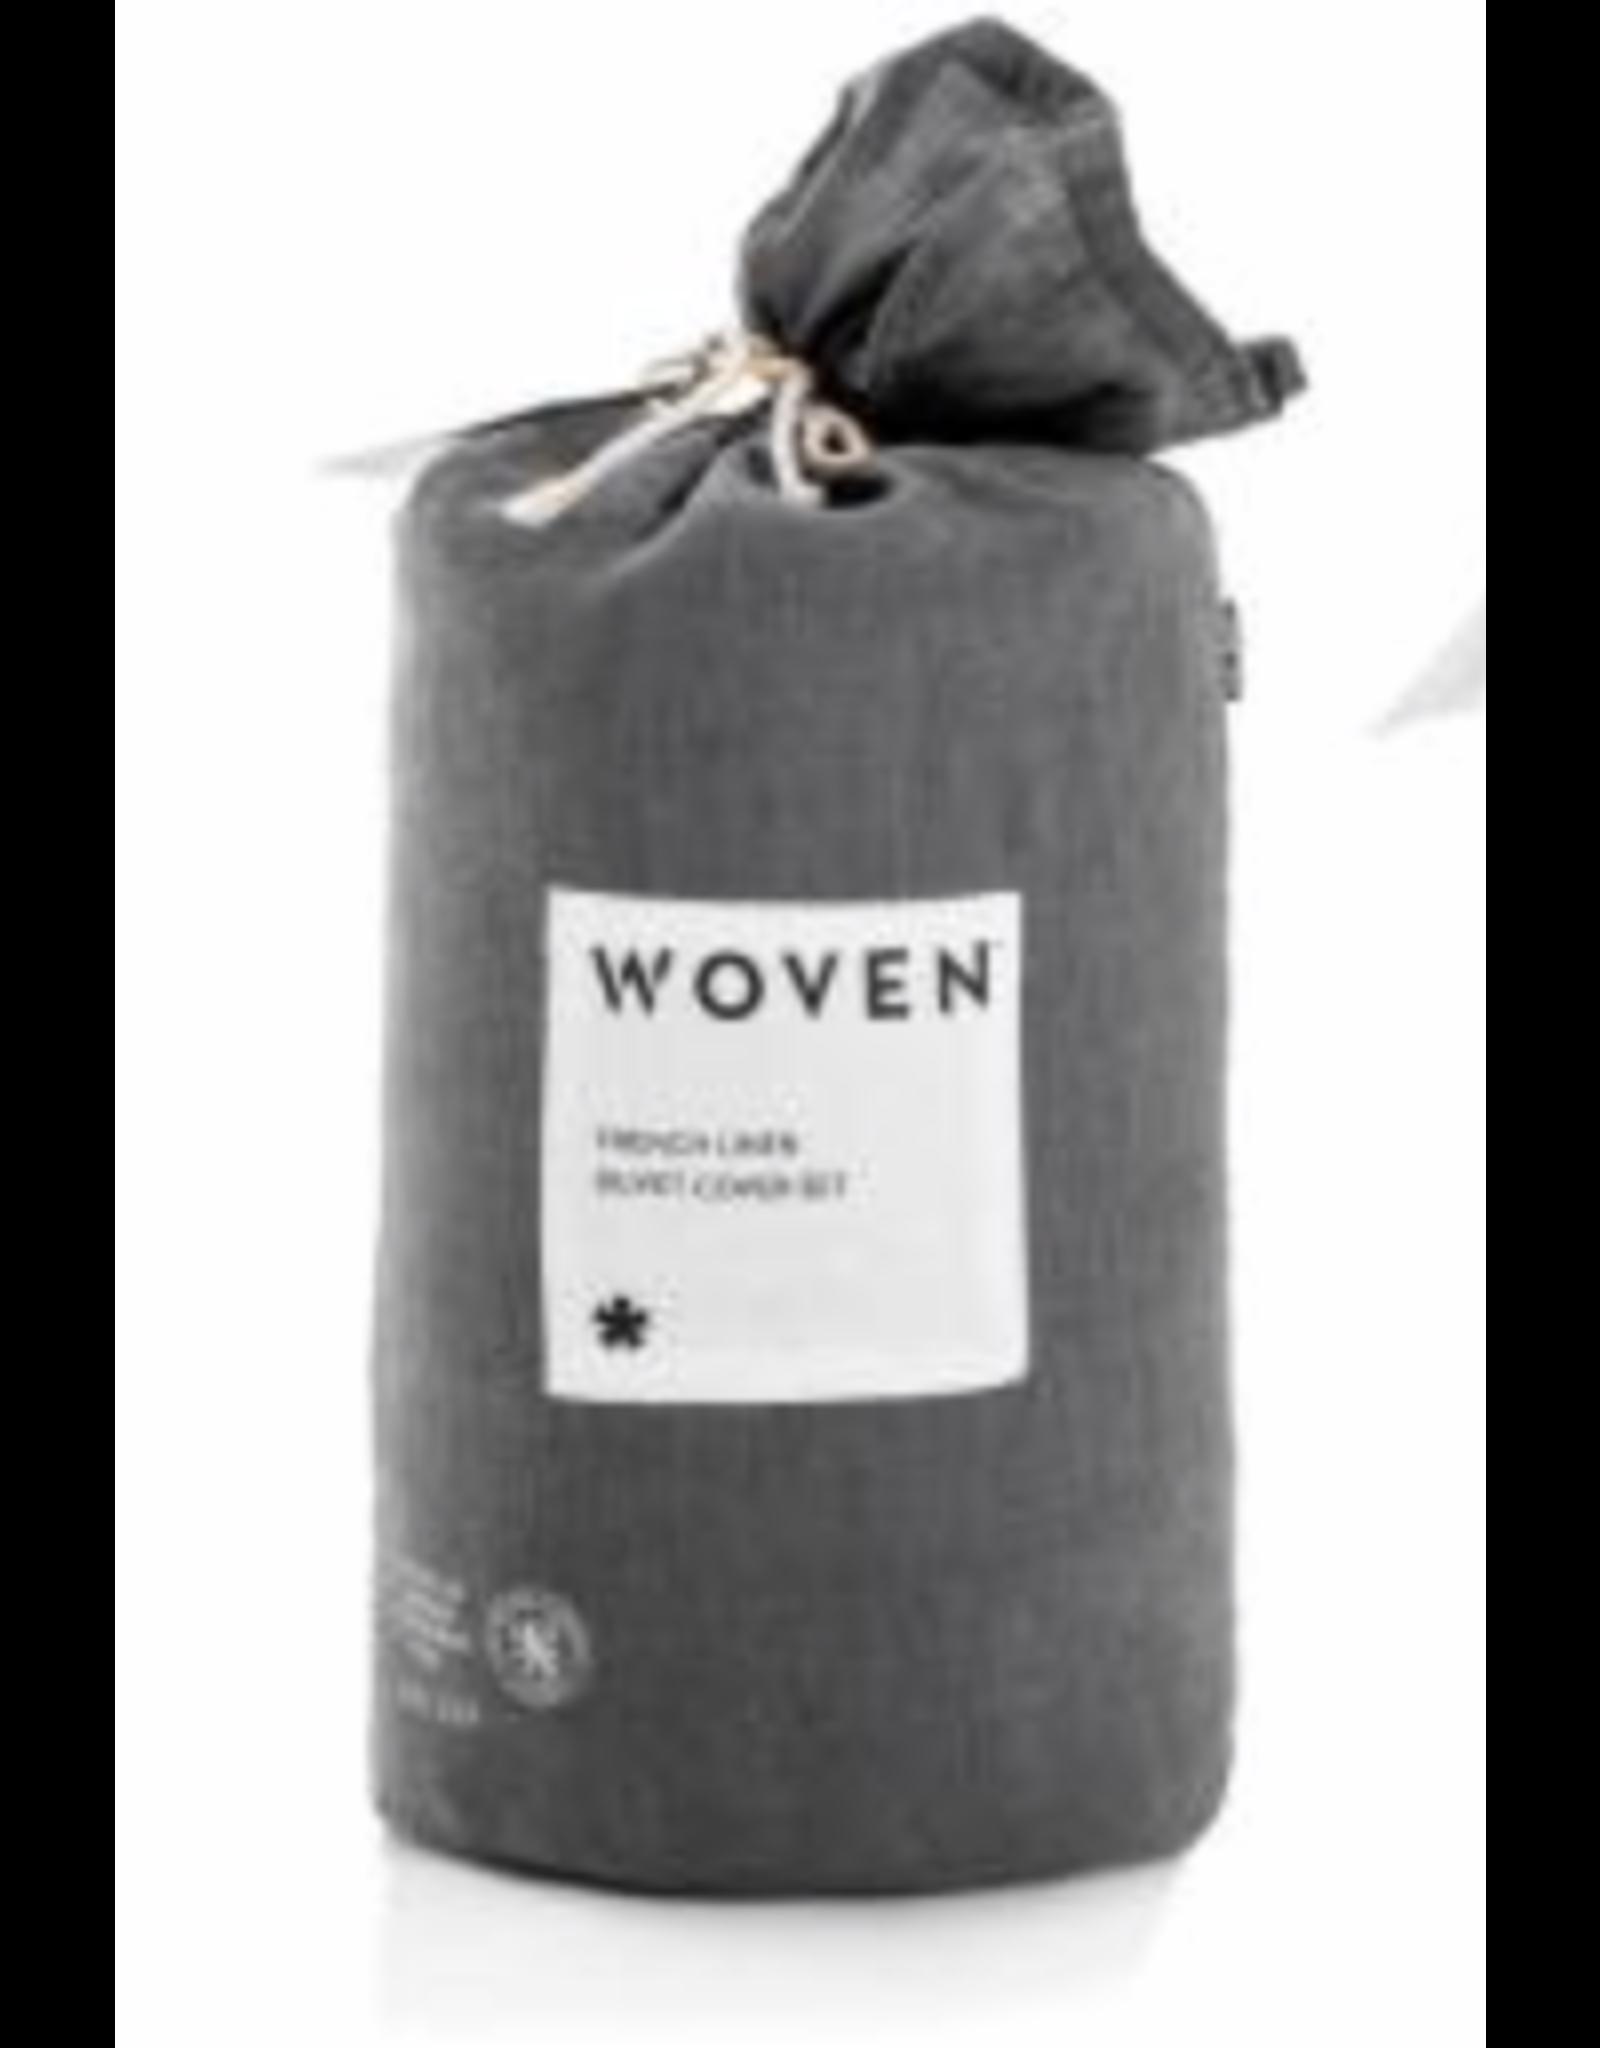 Woven French Linen Duvet Cover, Queen, Charcoal